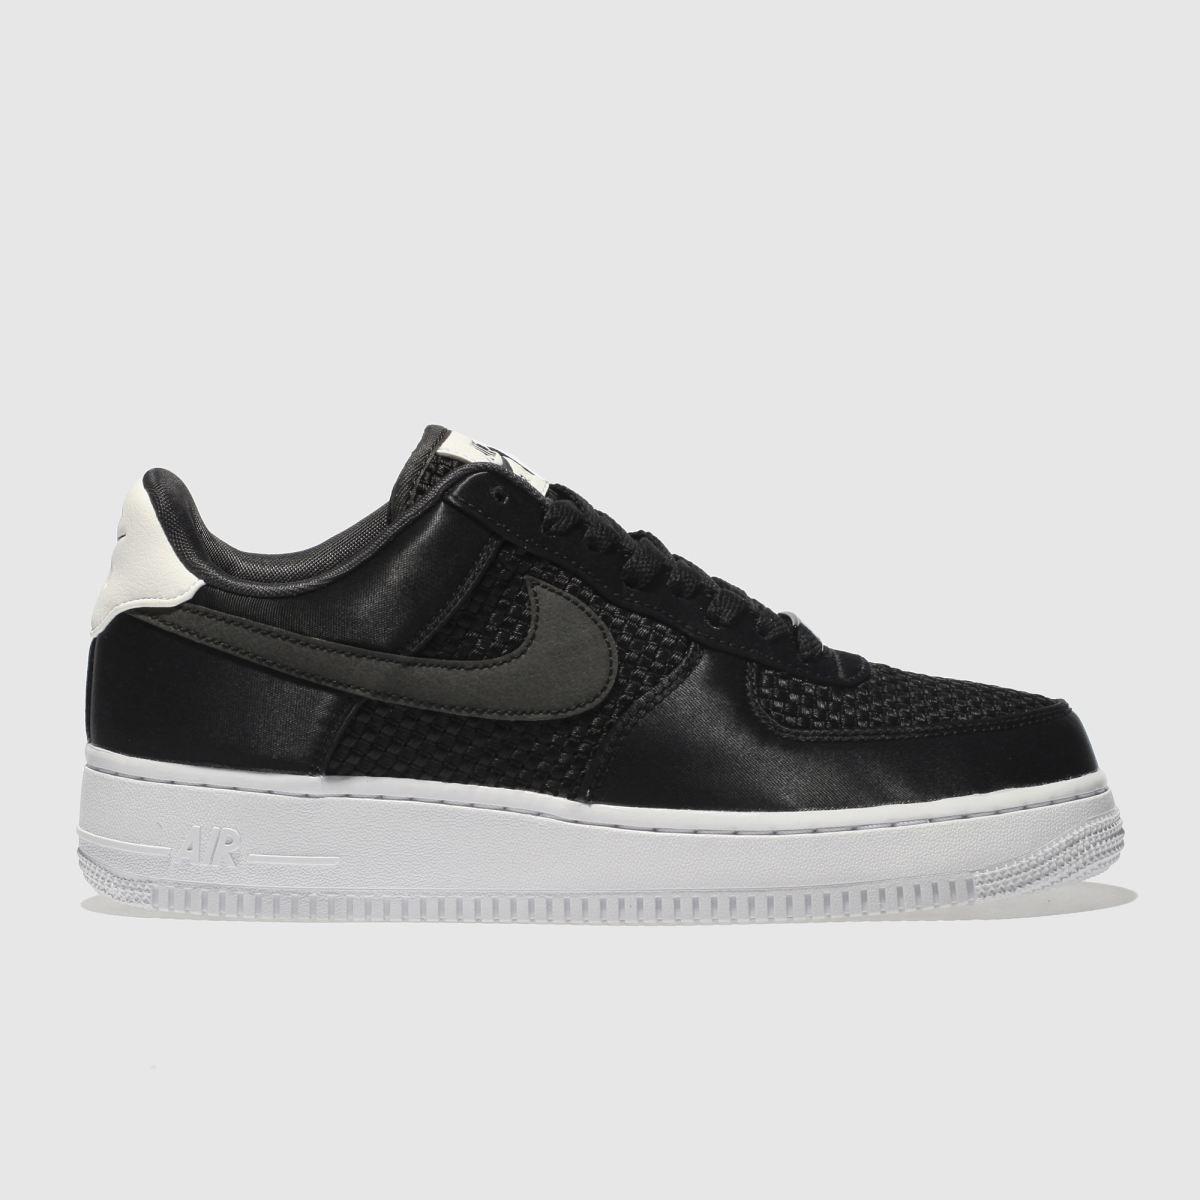 Nike Black & White Air Force 1 07 Se Trainers